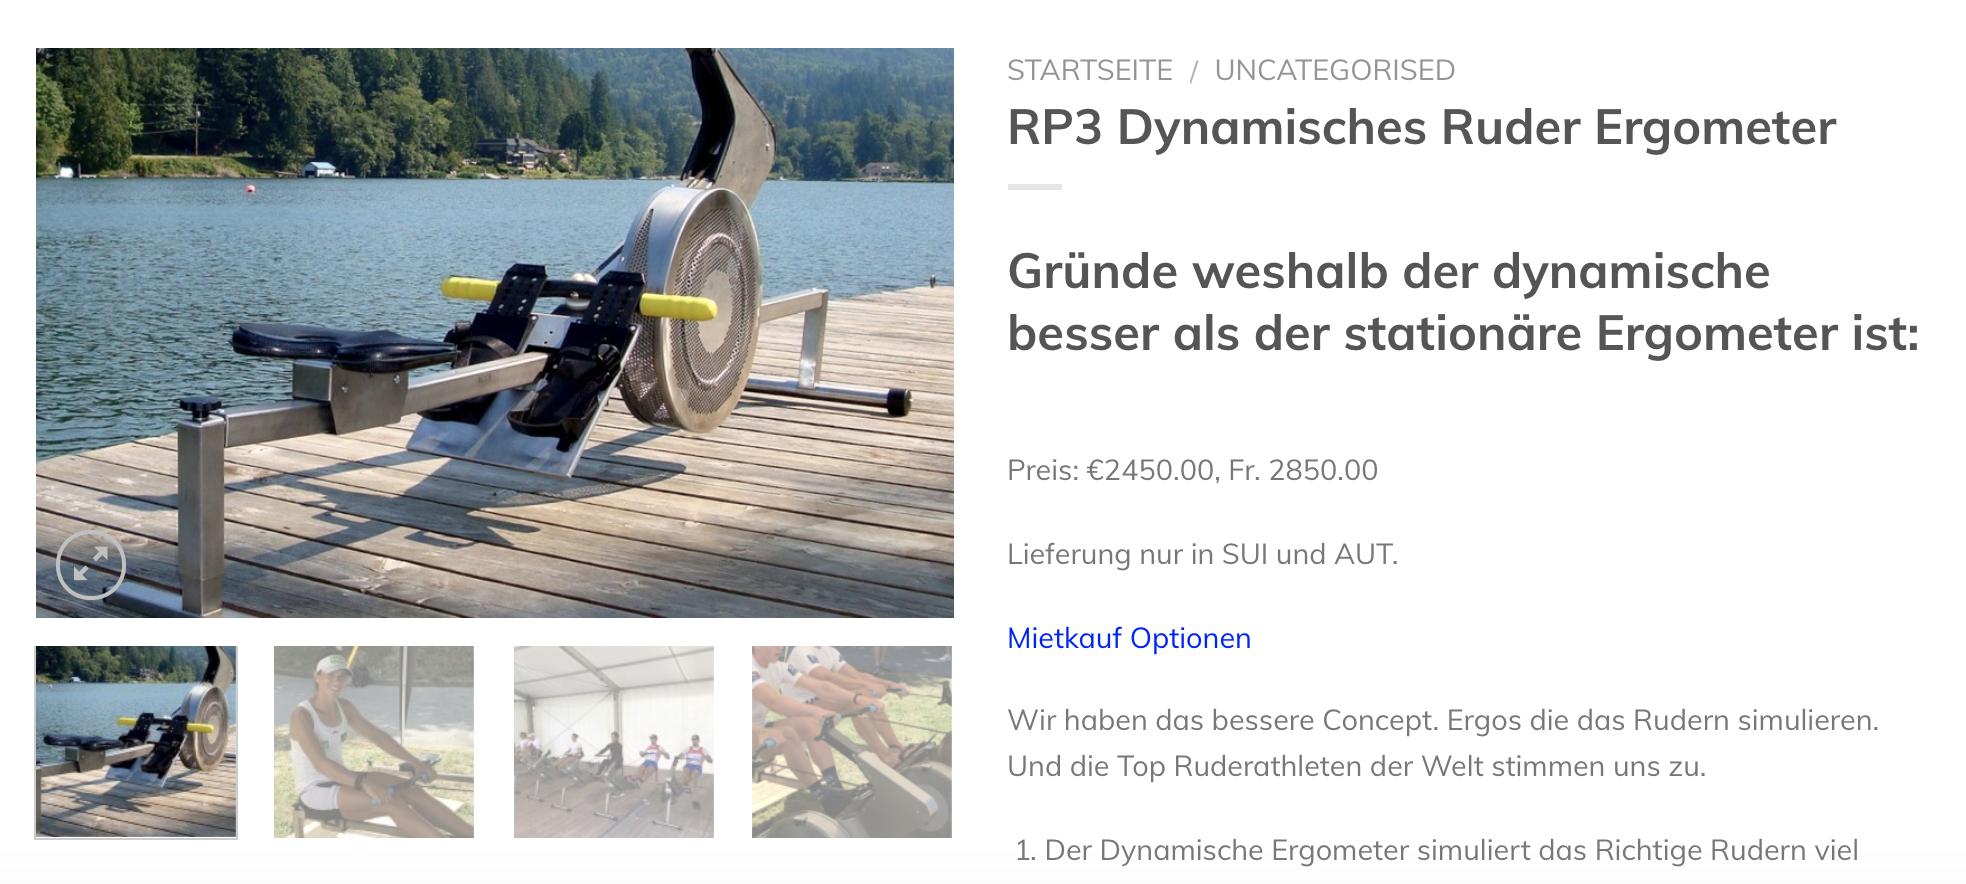 RP3 dynamishes Ruder Ergometer